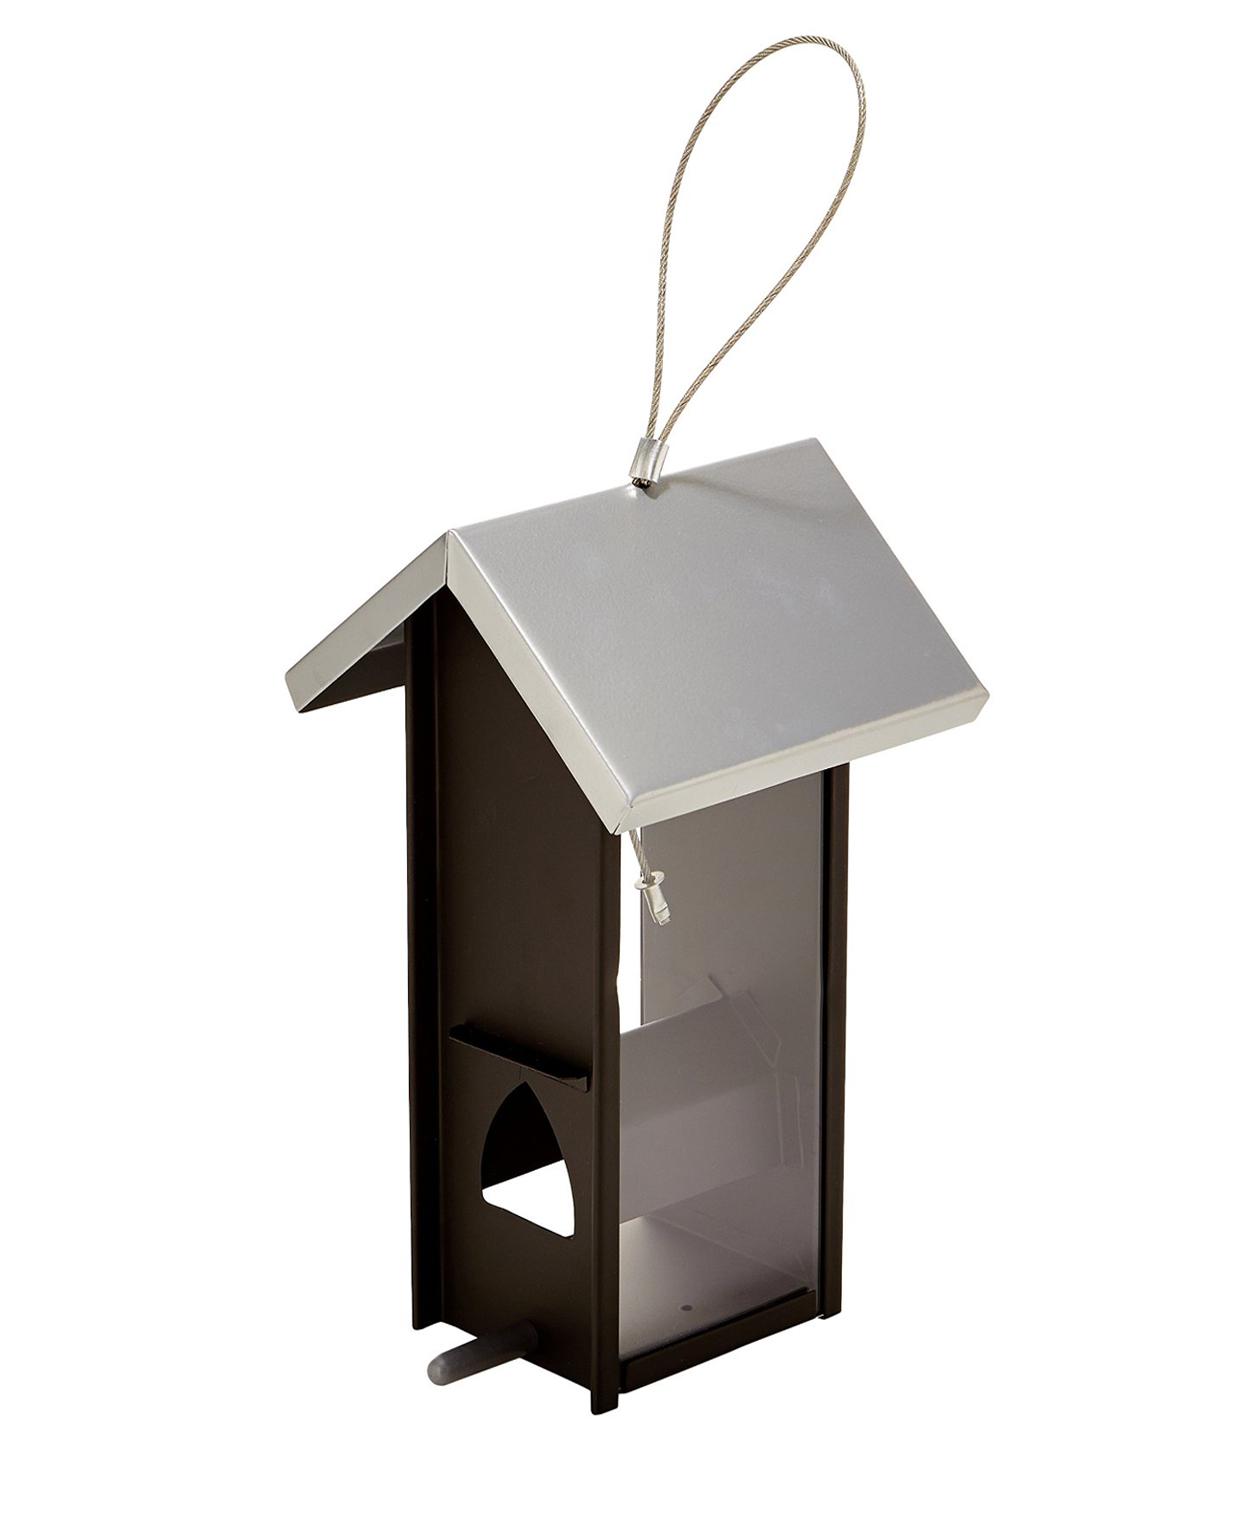 Mangeoire Suspendu Binky pour Oiseau de Vadigran